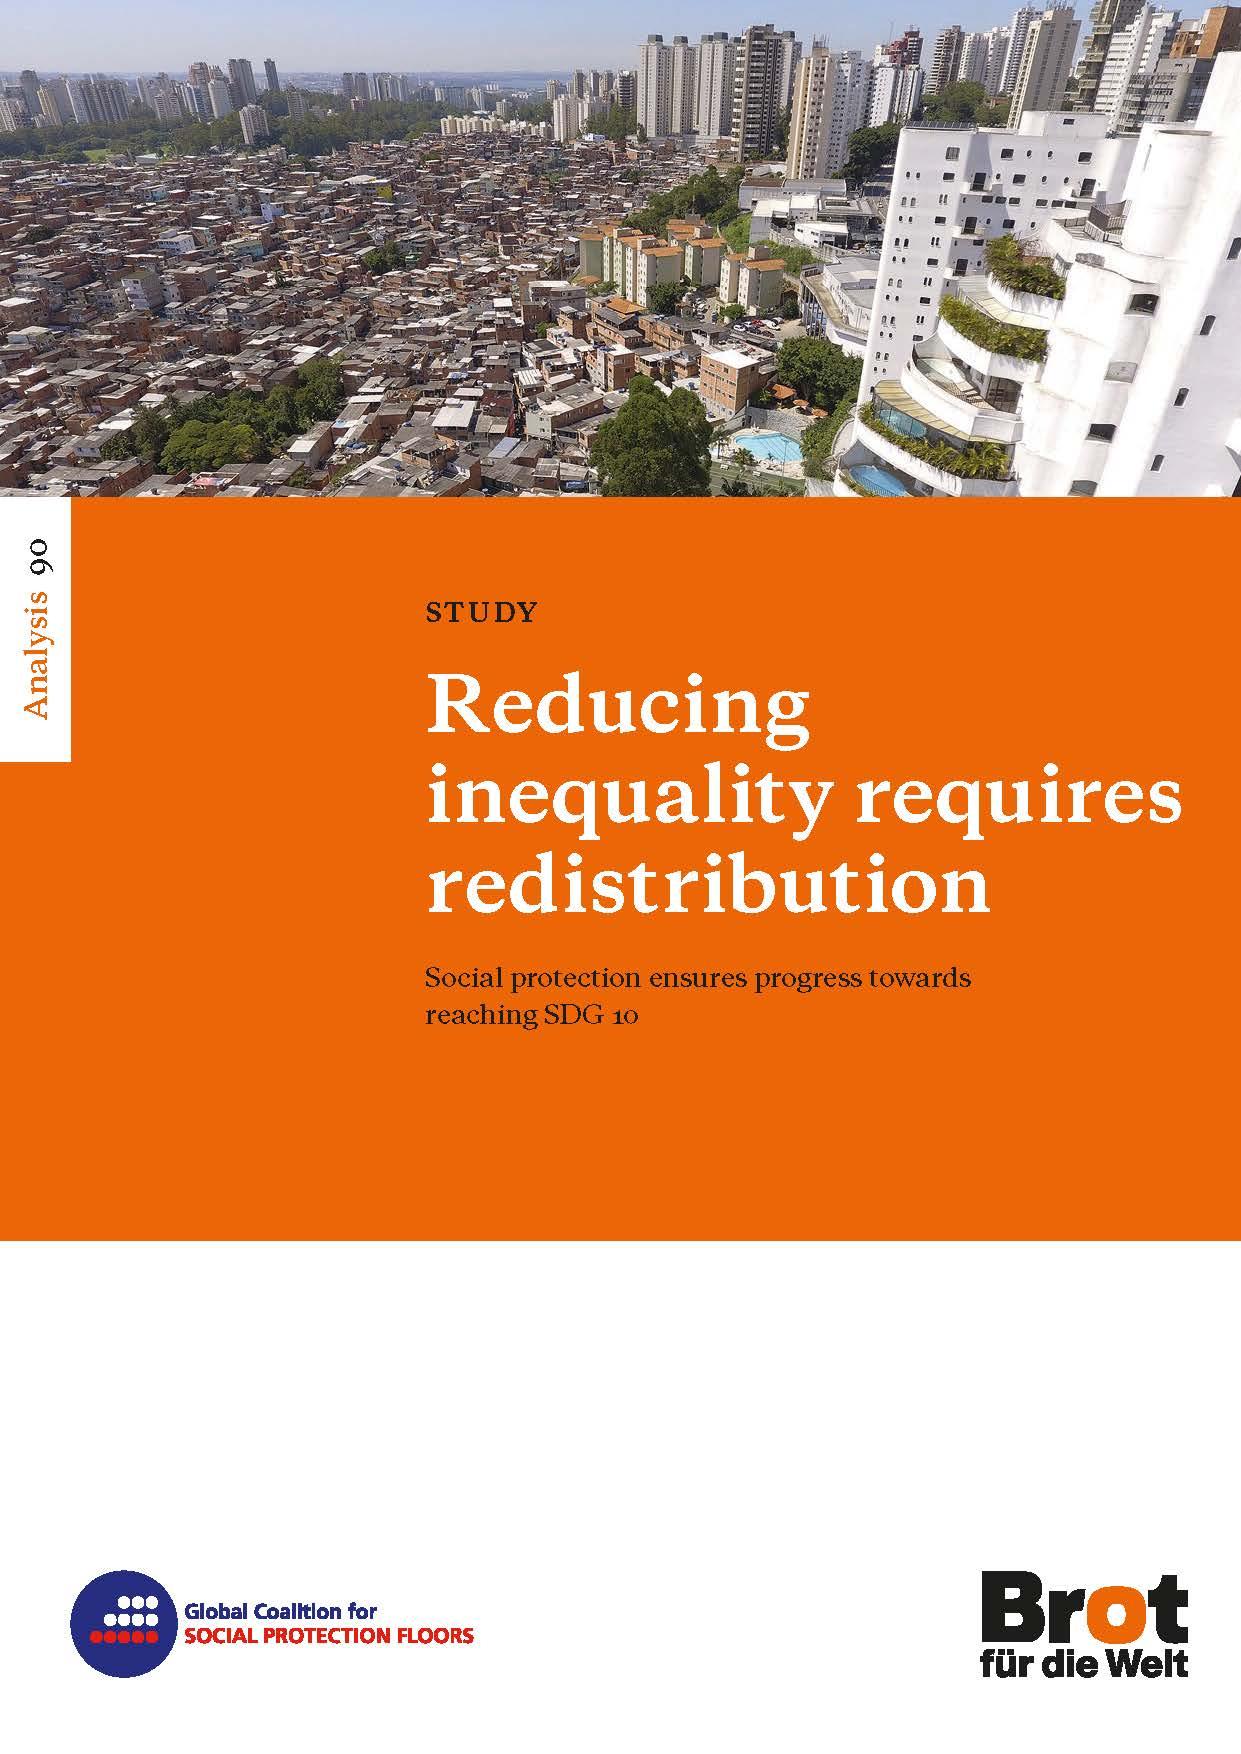 Analysis 90: Reducing inequality requires redistribution